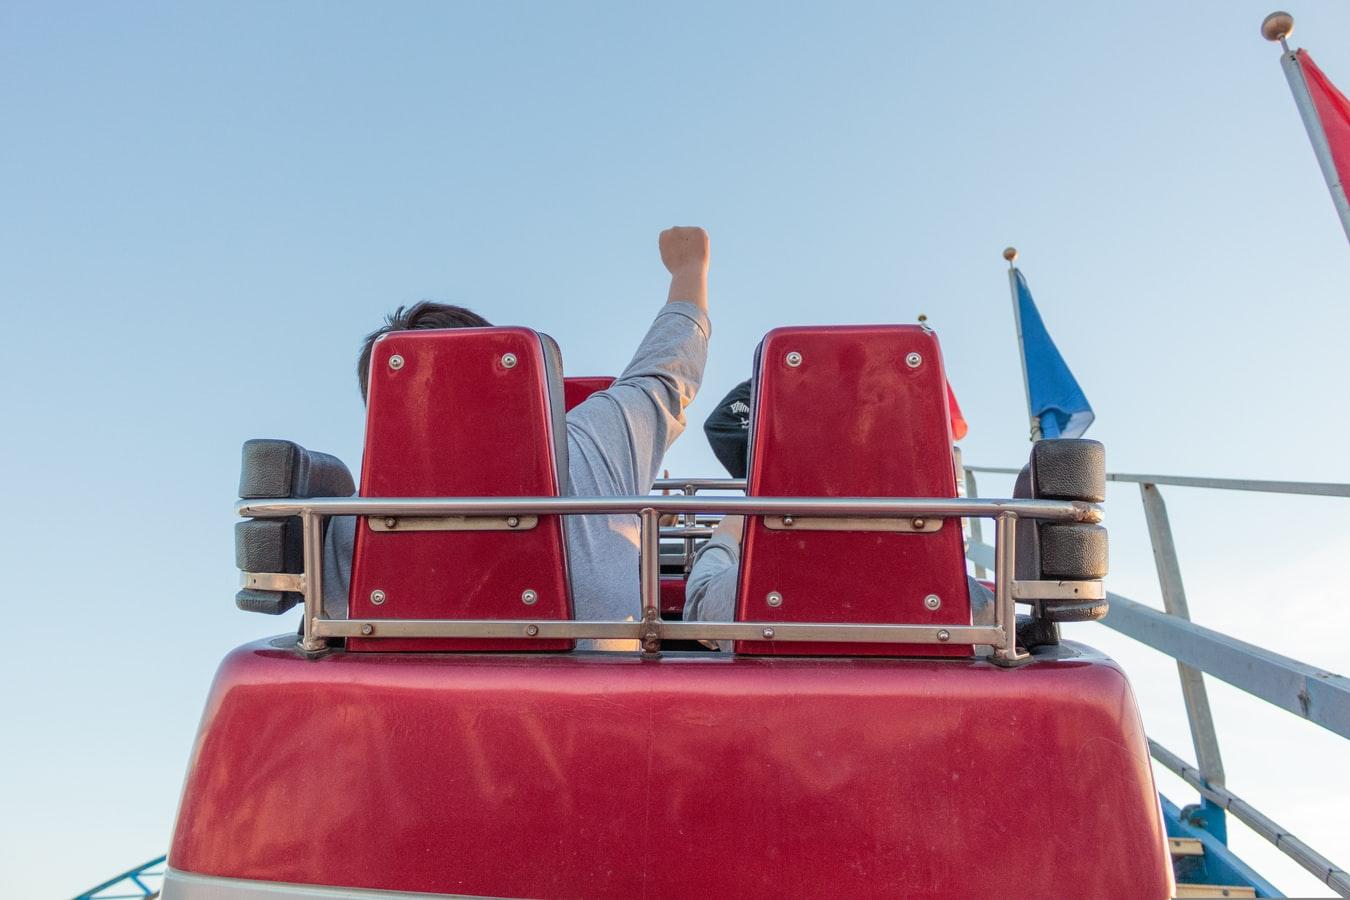 Six Flags Great America Gurnee, IL